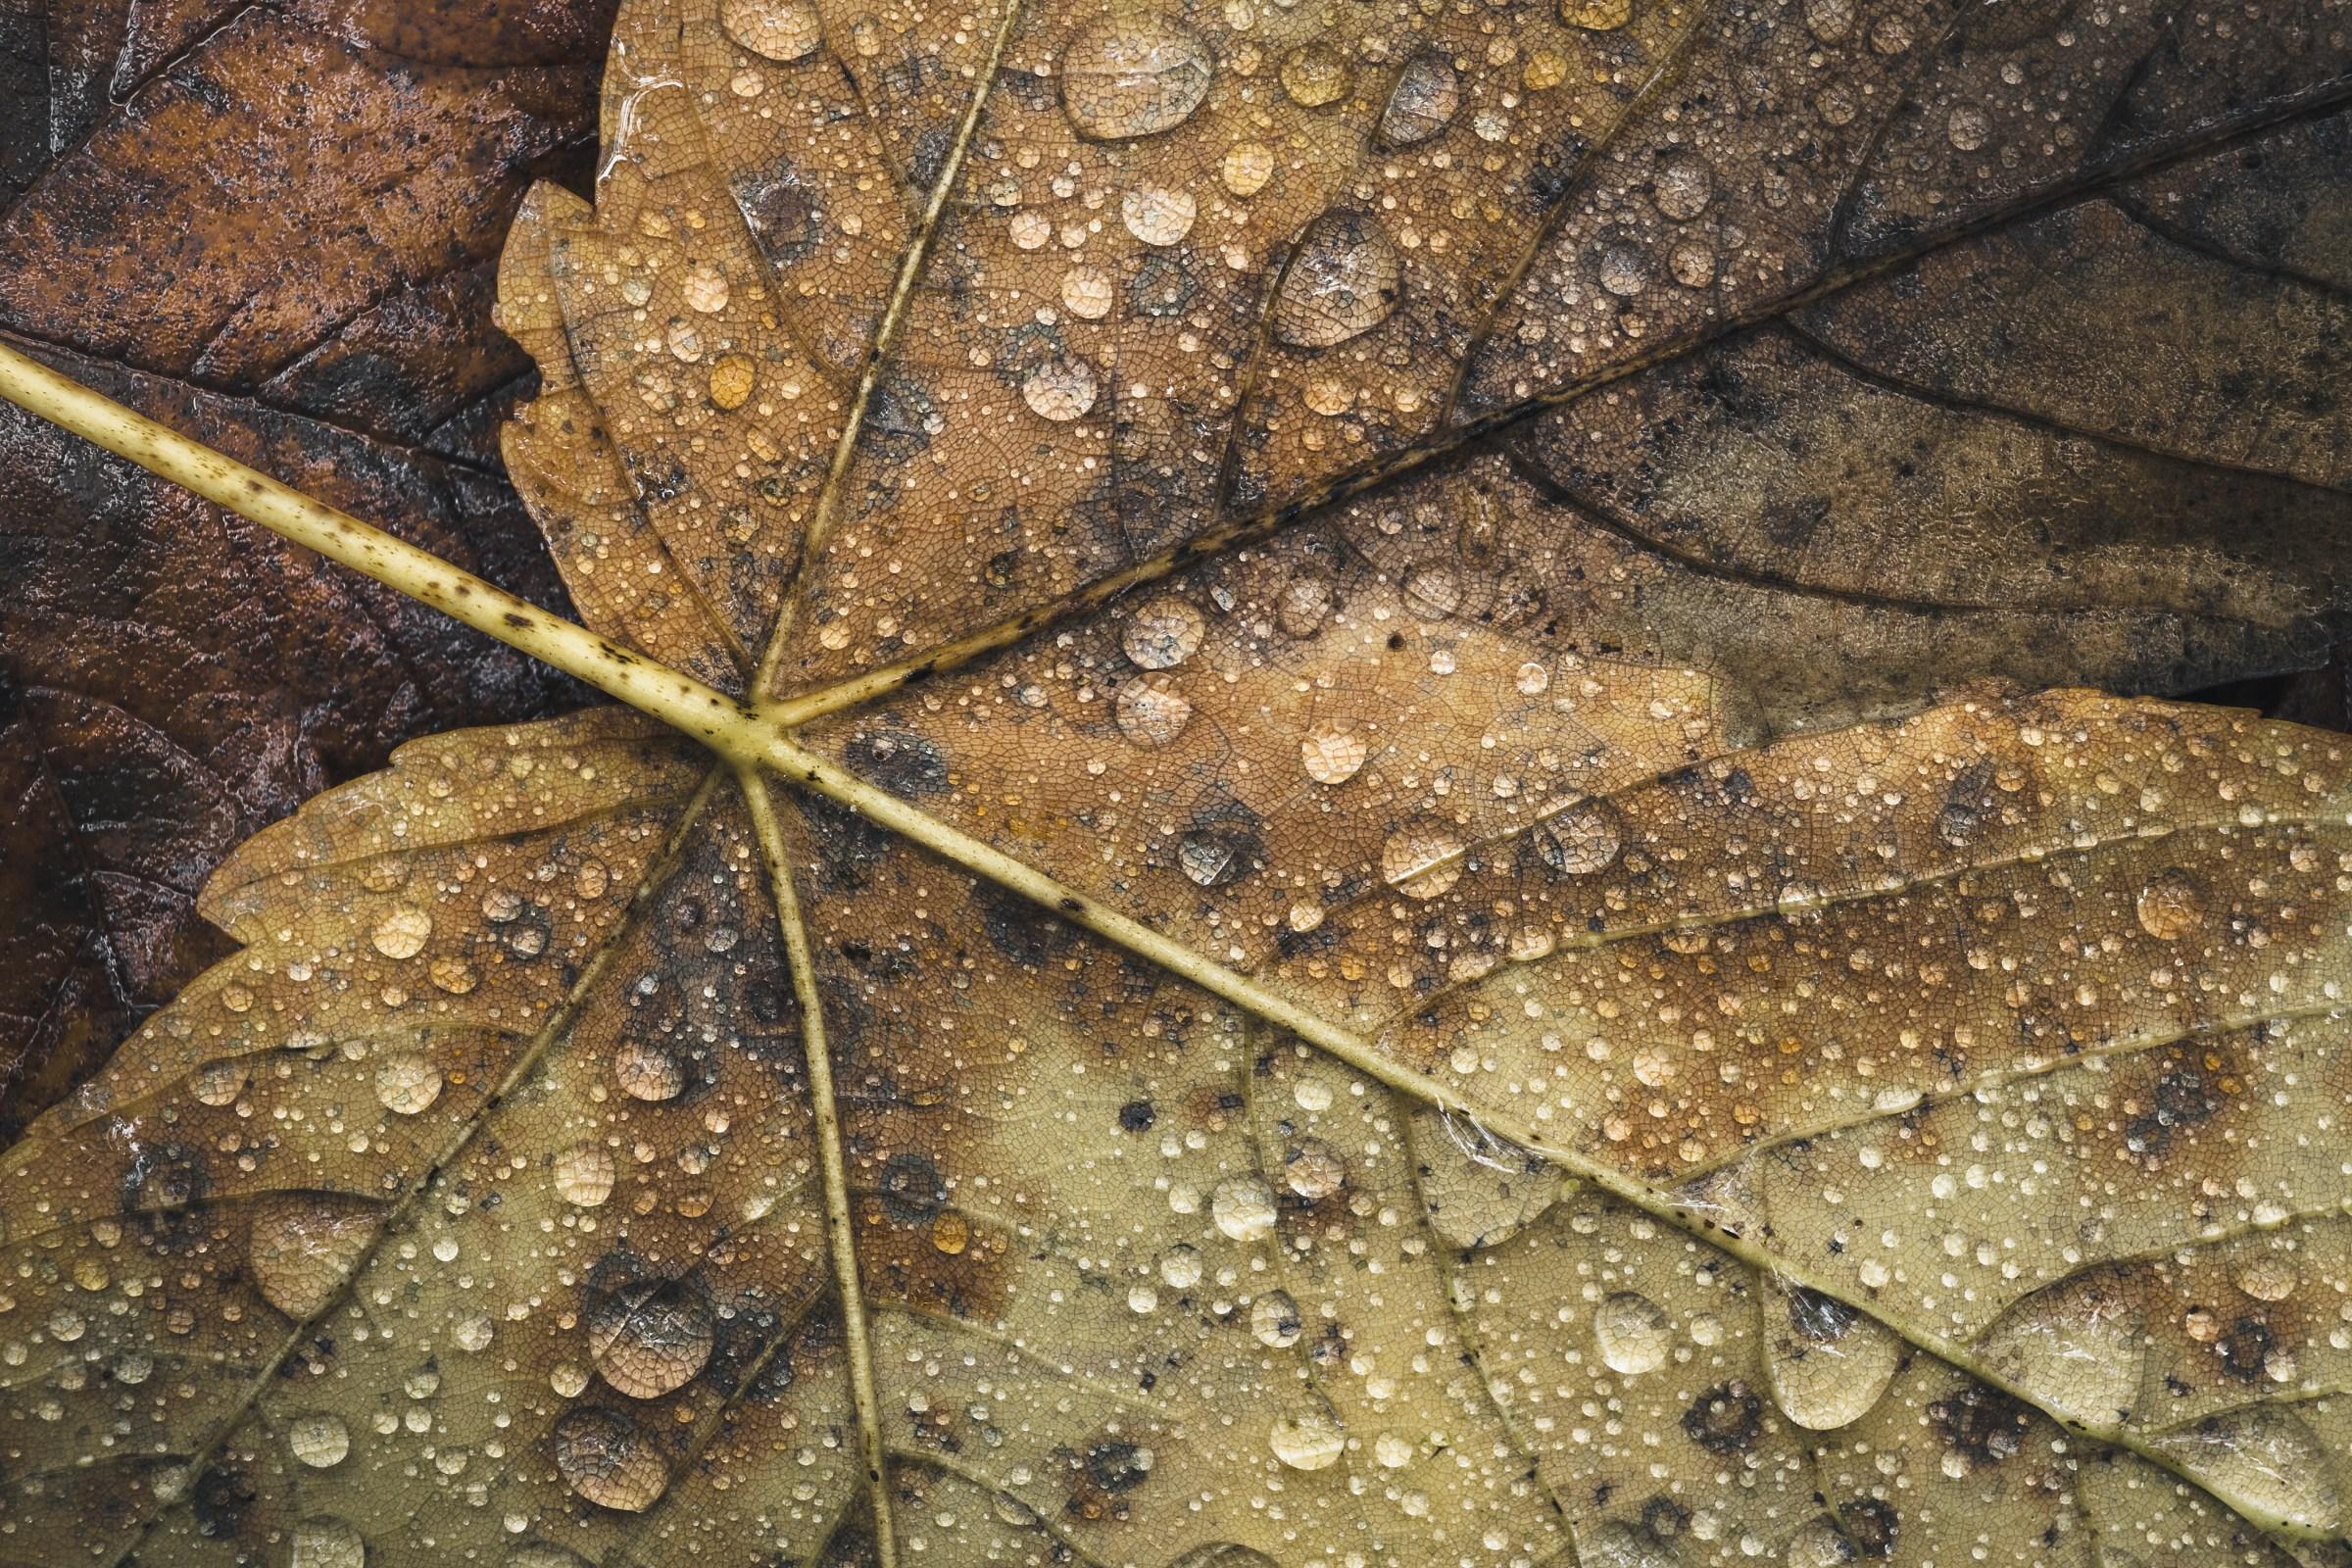 Maple leaf in morning dew